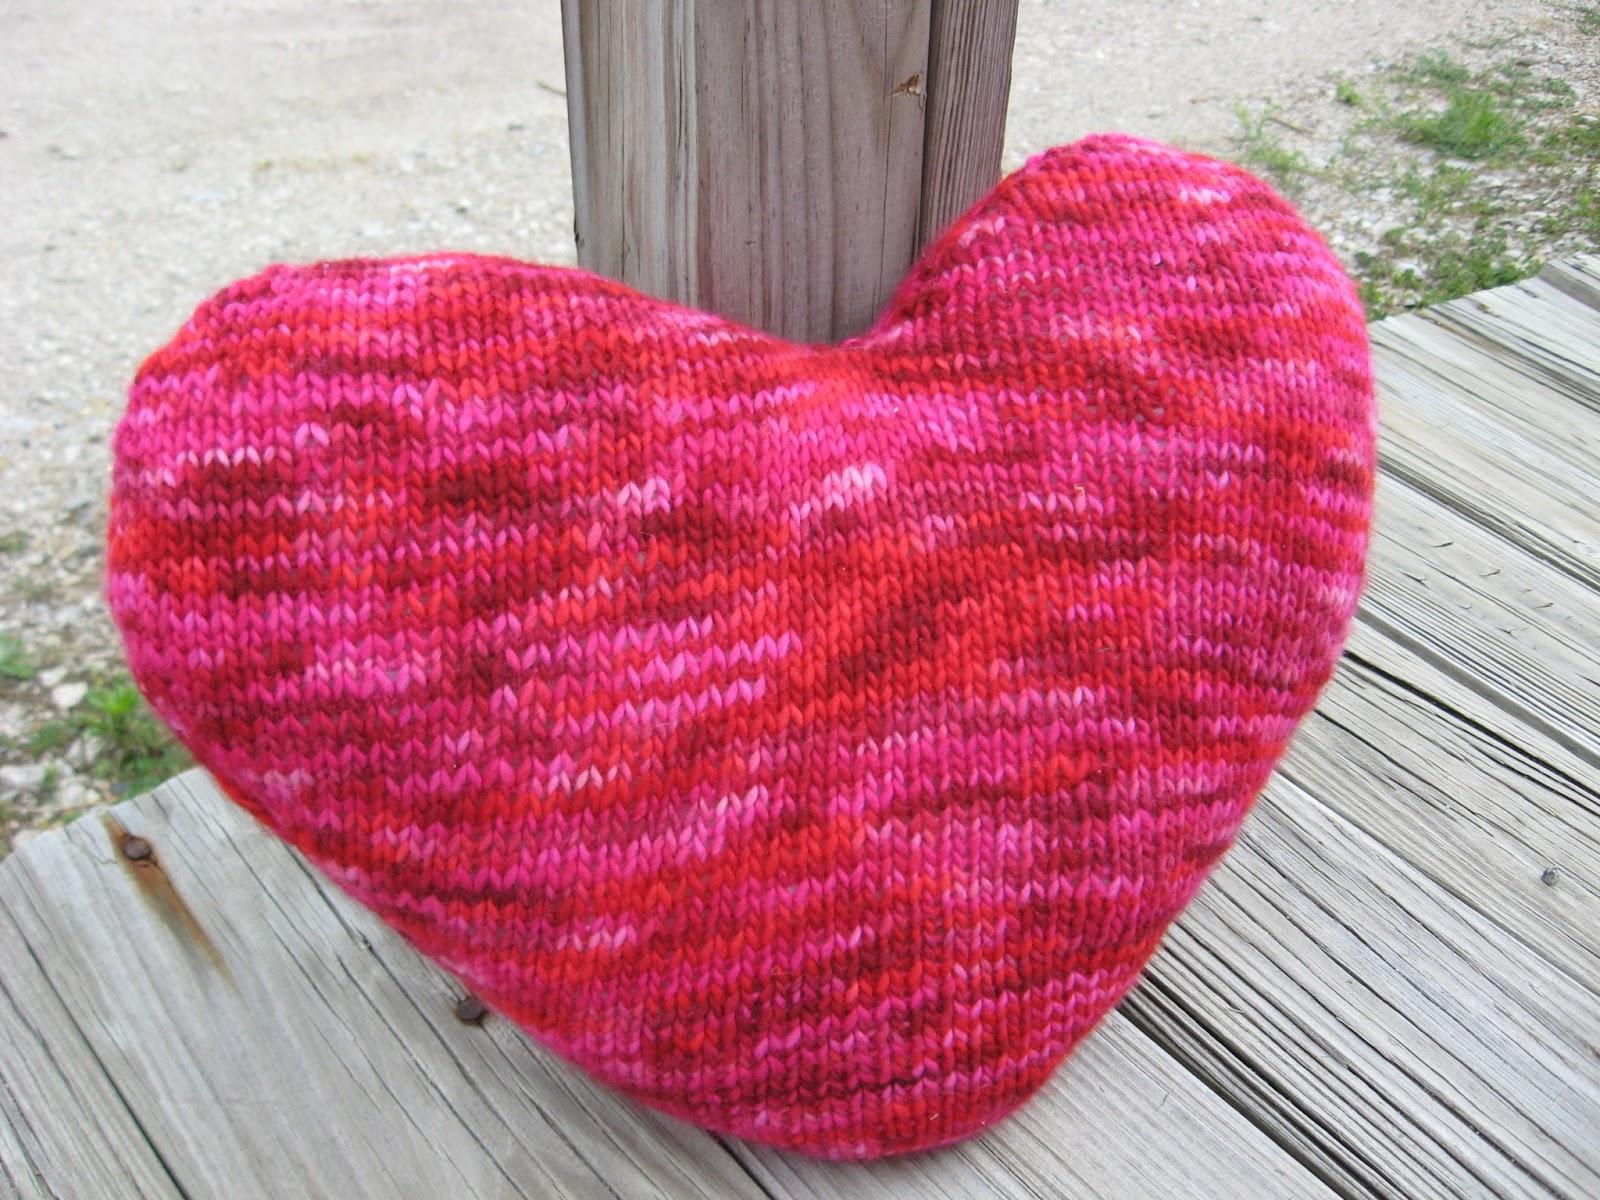 Heart pillow knitting pattern free perplexcitysentinel get the free pattern source heart pillow knitting pattern free perplexcitysentinel com bankloansurffo Gallery